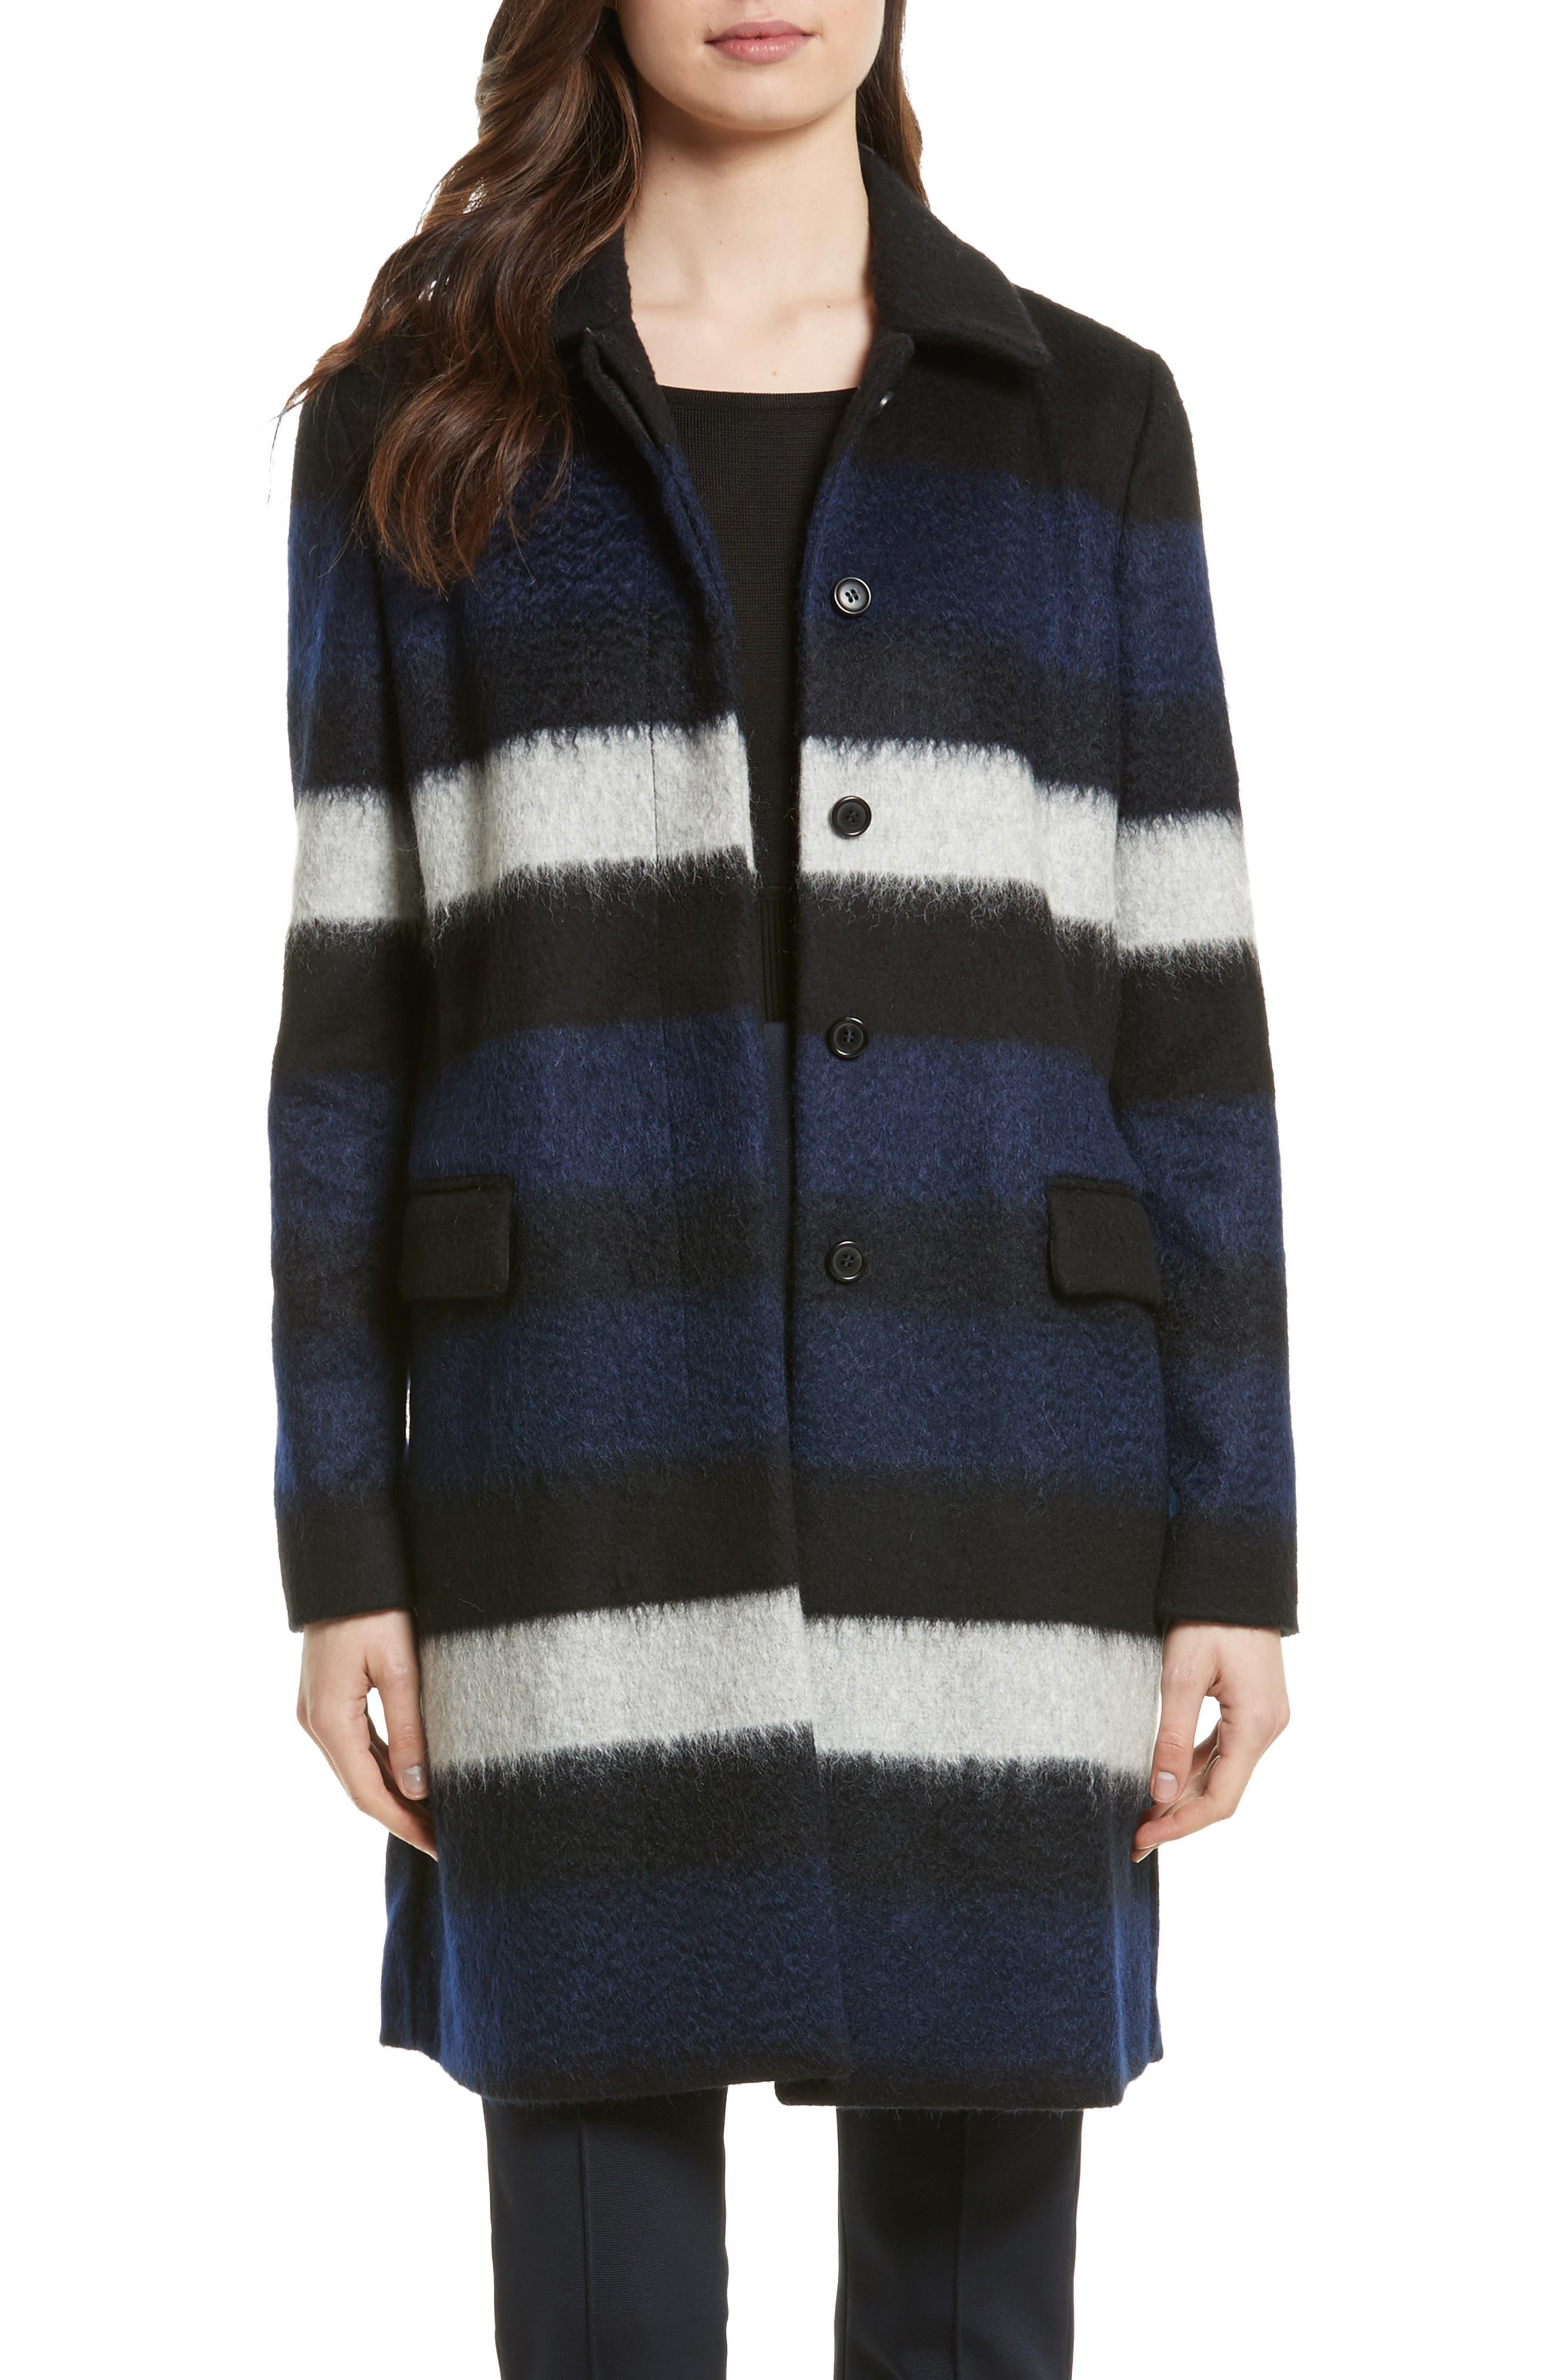 DIANE VON FURSTENBERG Stripe Wool Blend Coat, Main, color, 005